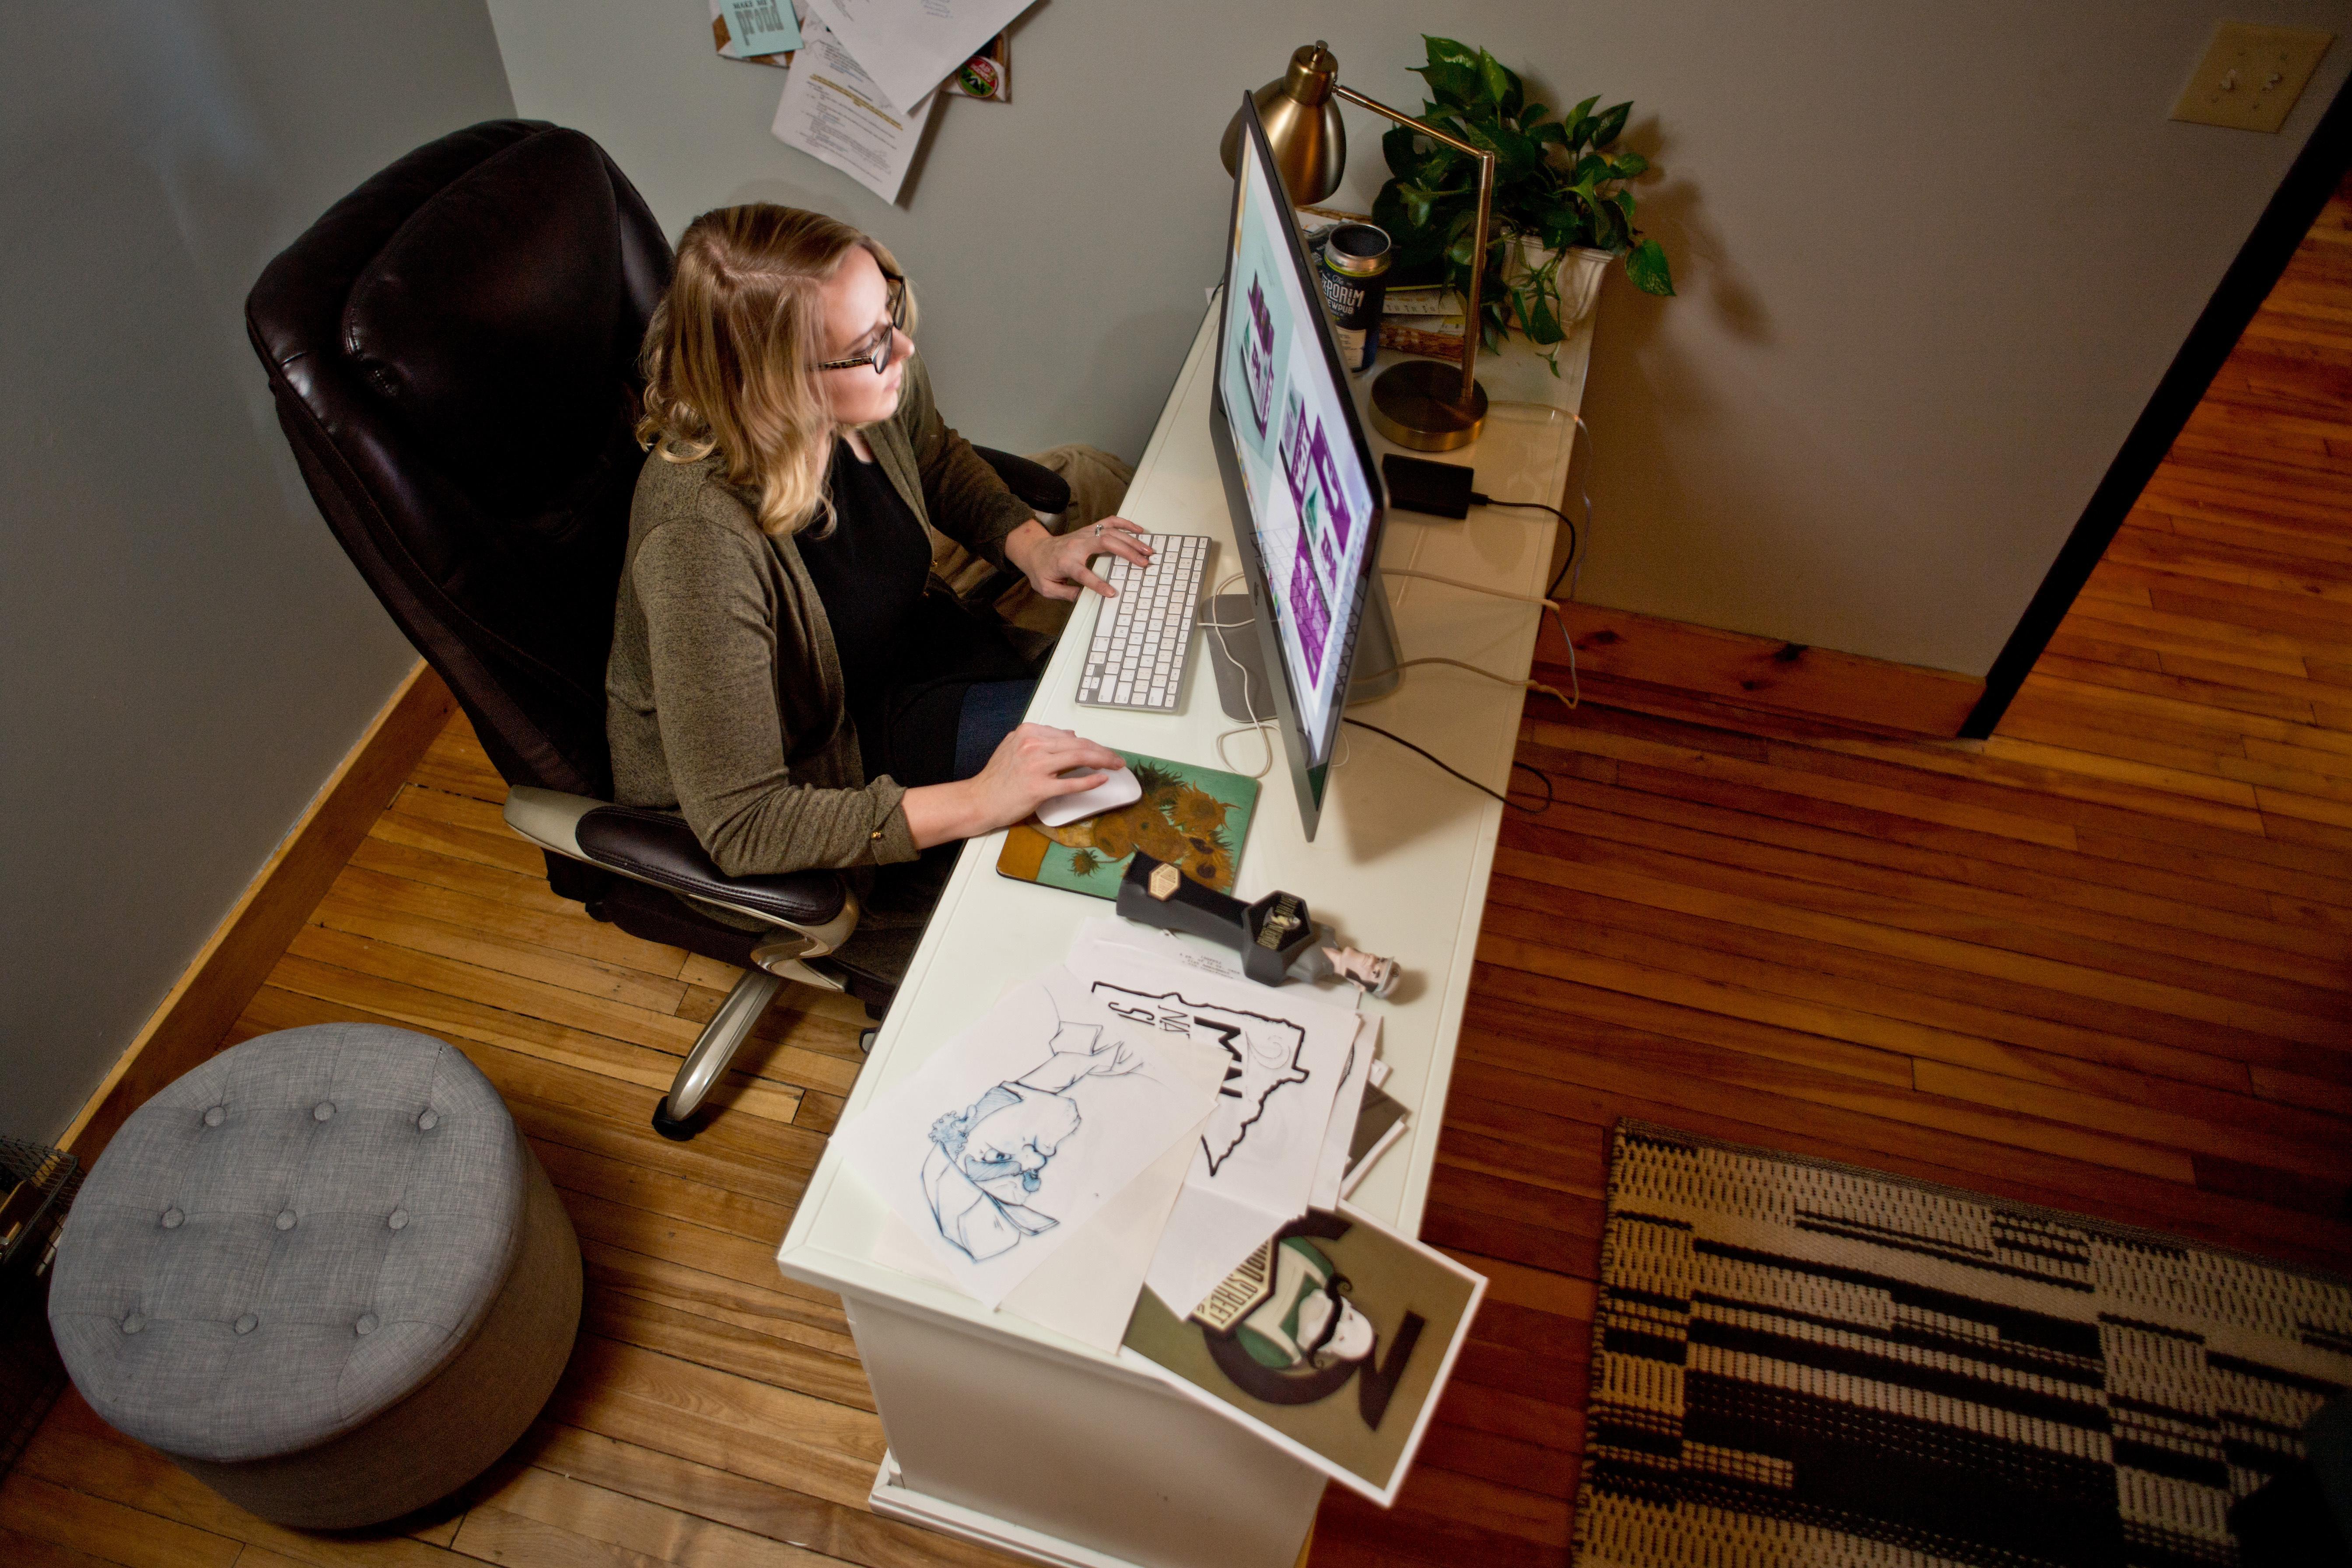 Jodie Pundsack of Gaslight Creative working at her desk